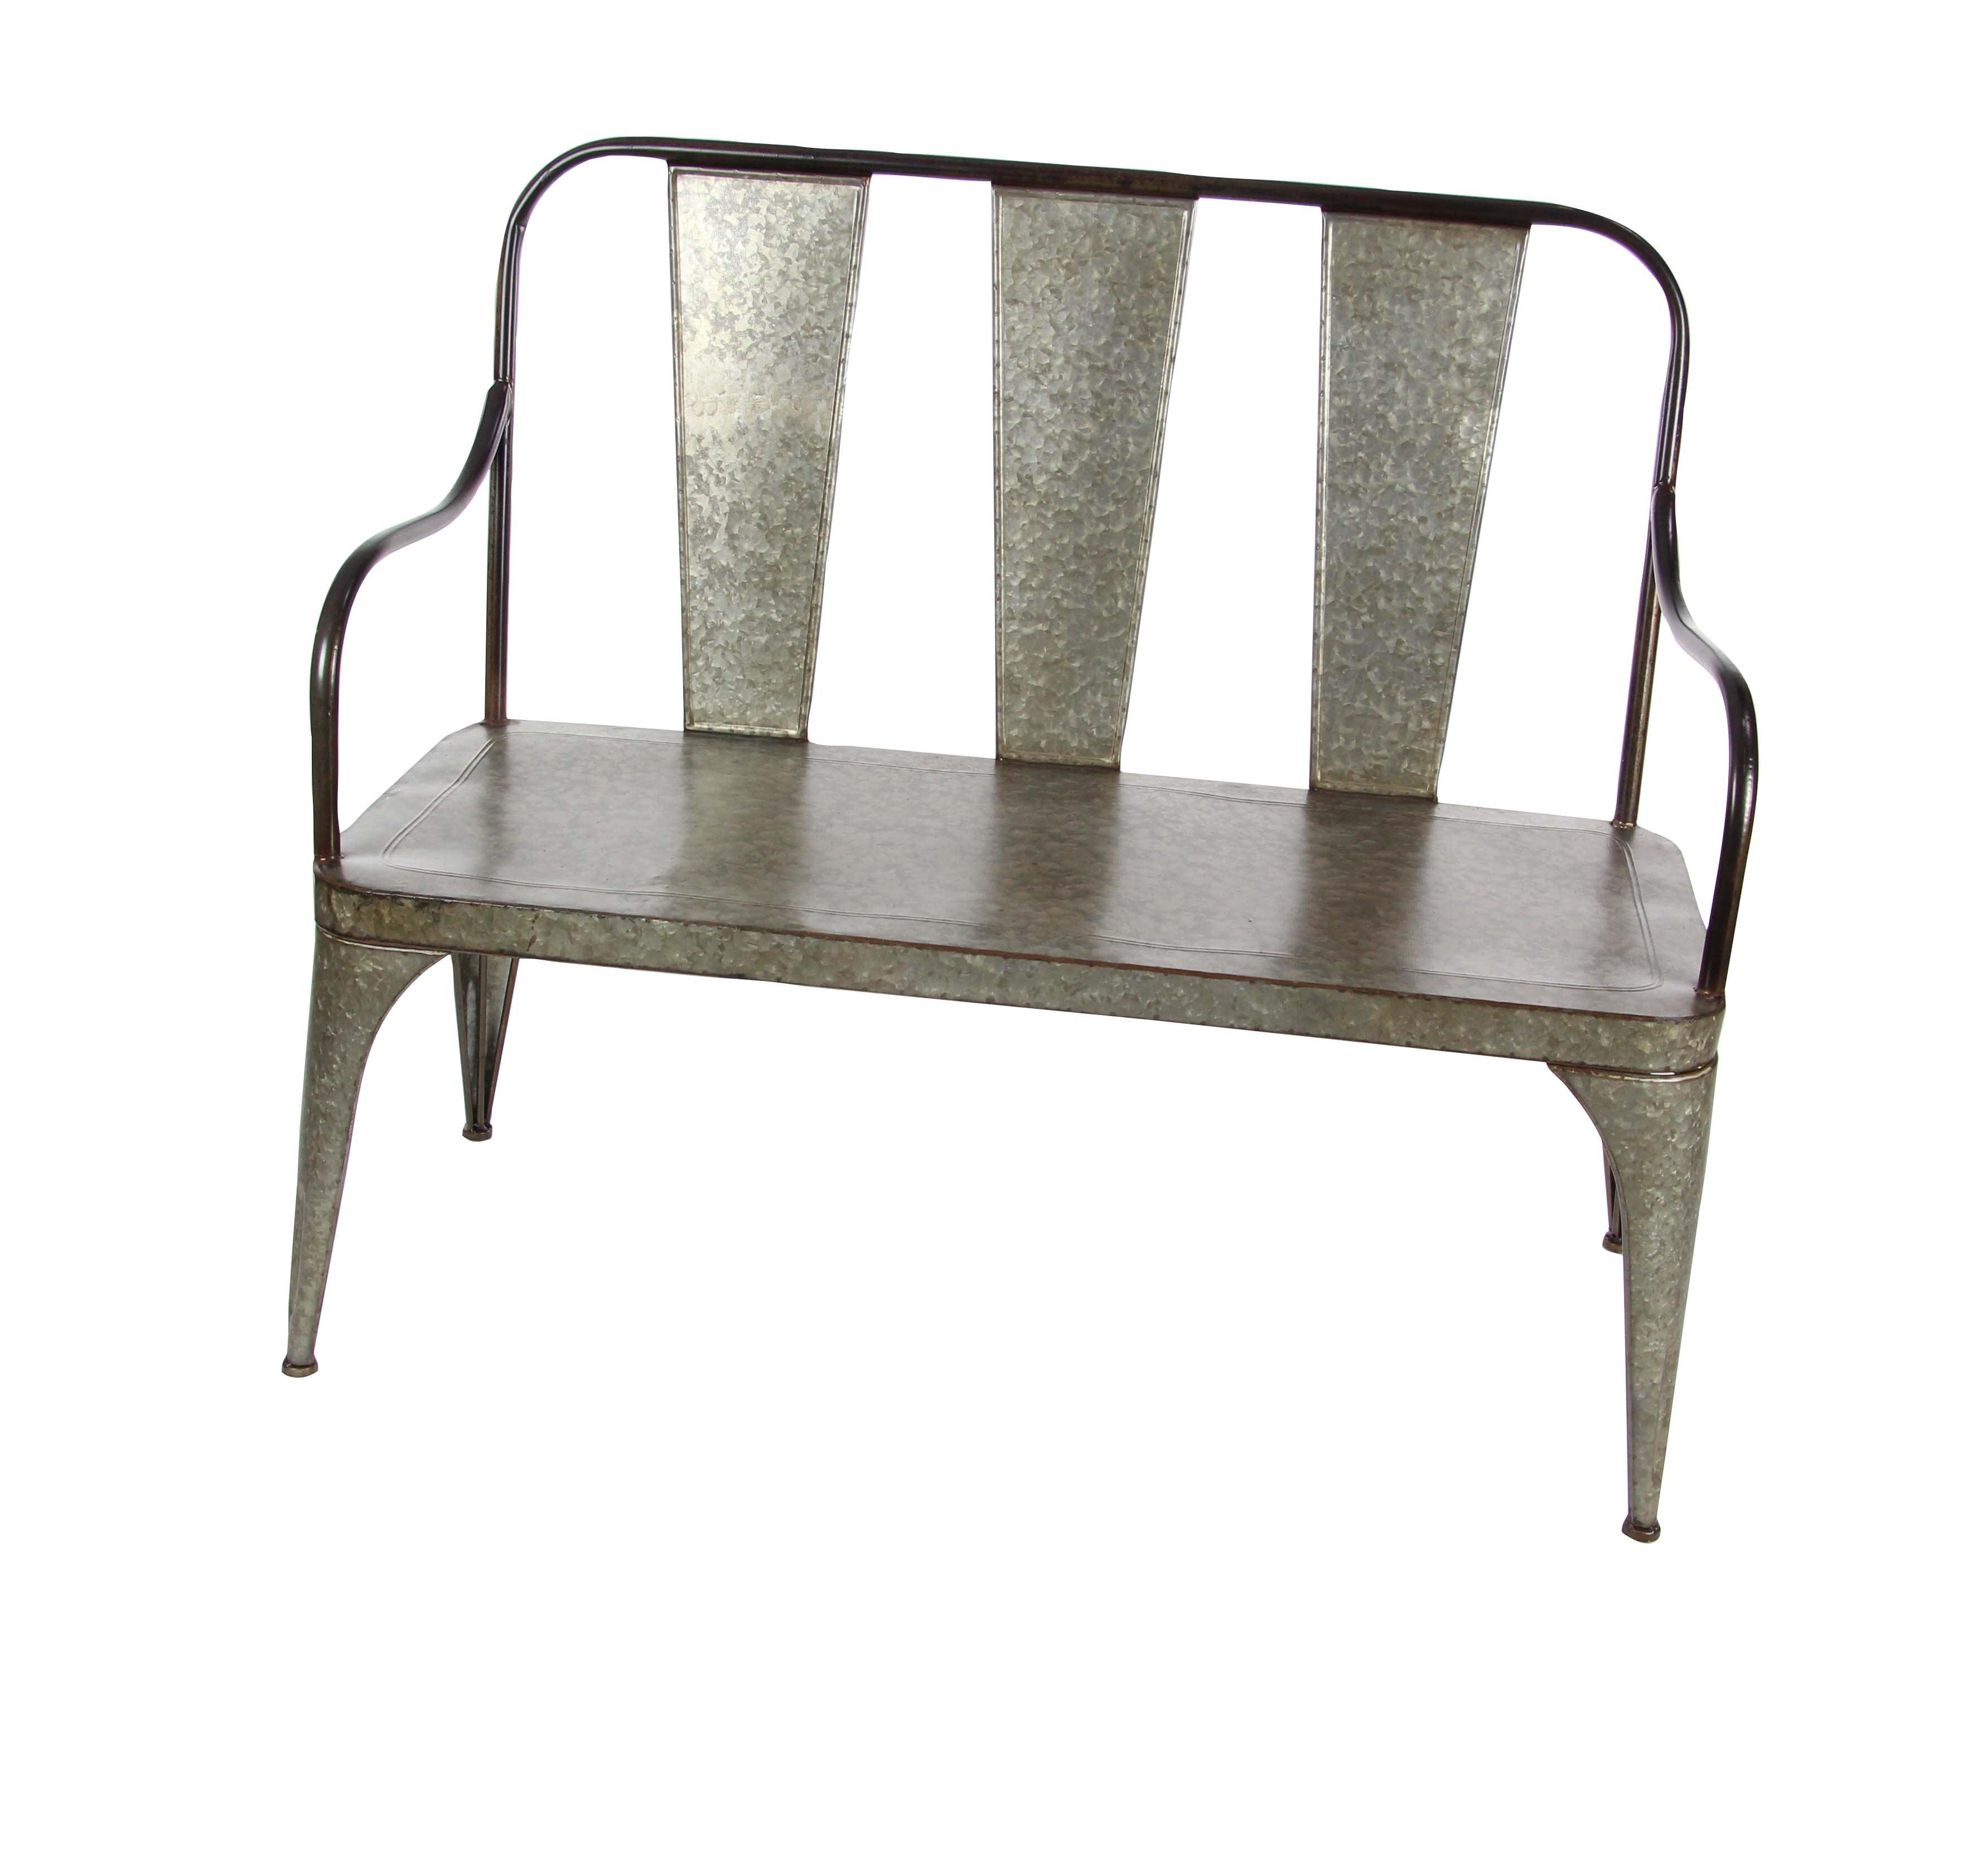 Decmode Galvanized Silver Metal Outdoor Bench 45 X 40 Walmart Com Walmart Com